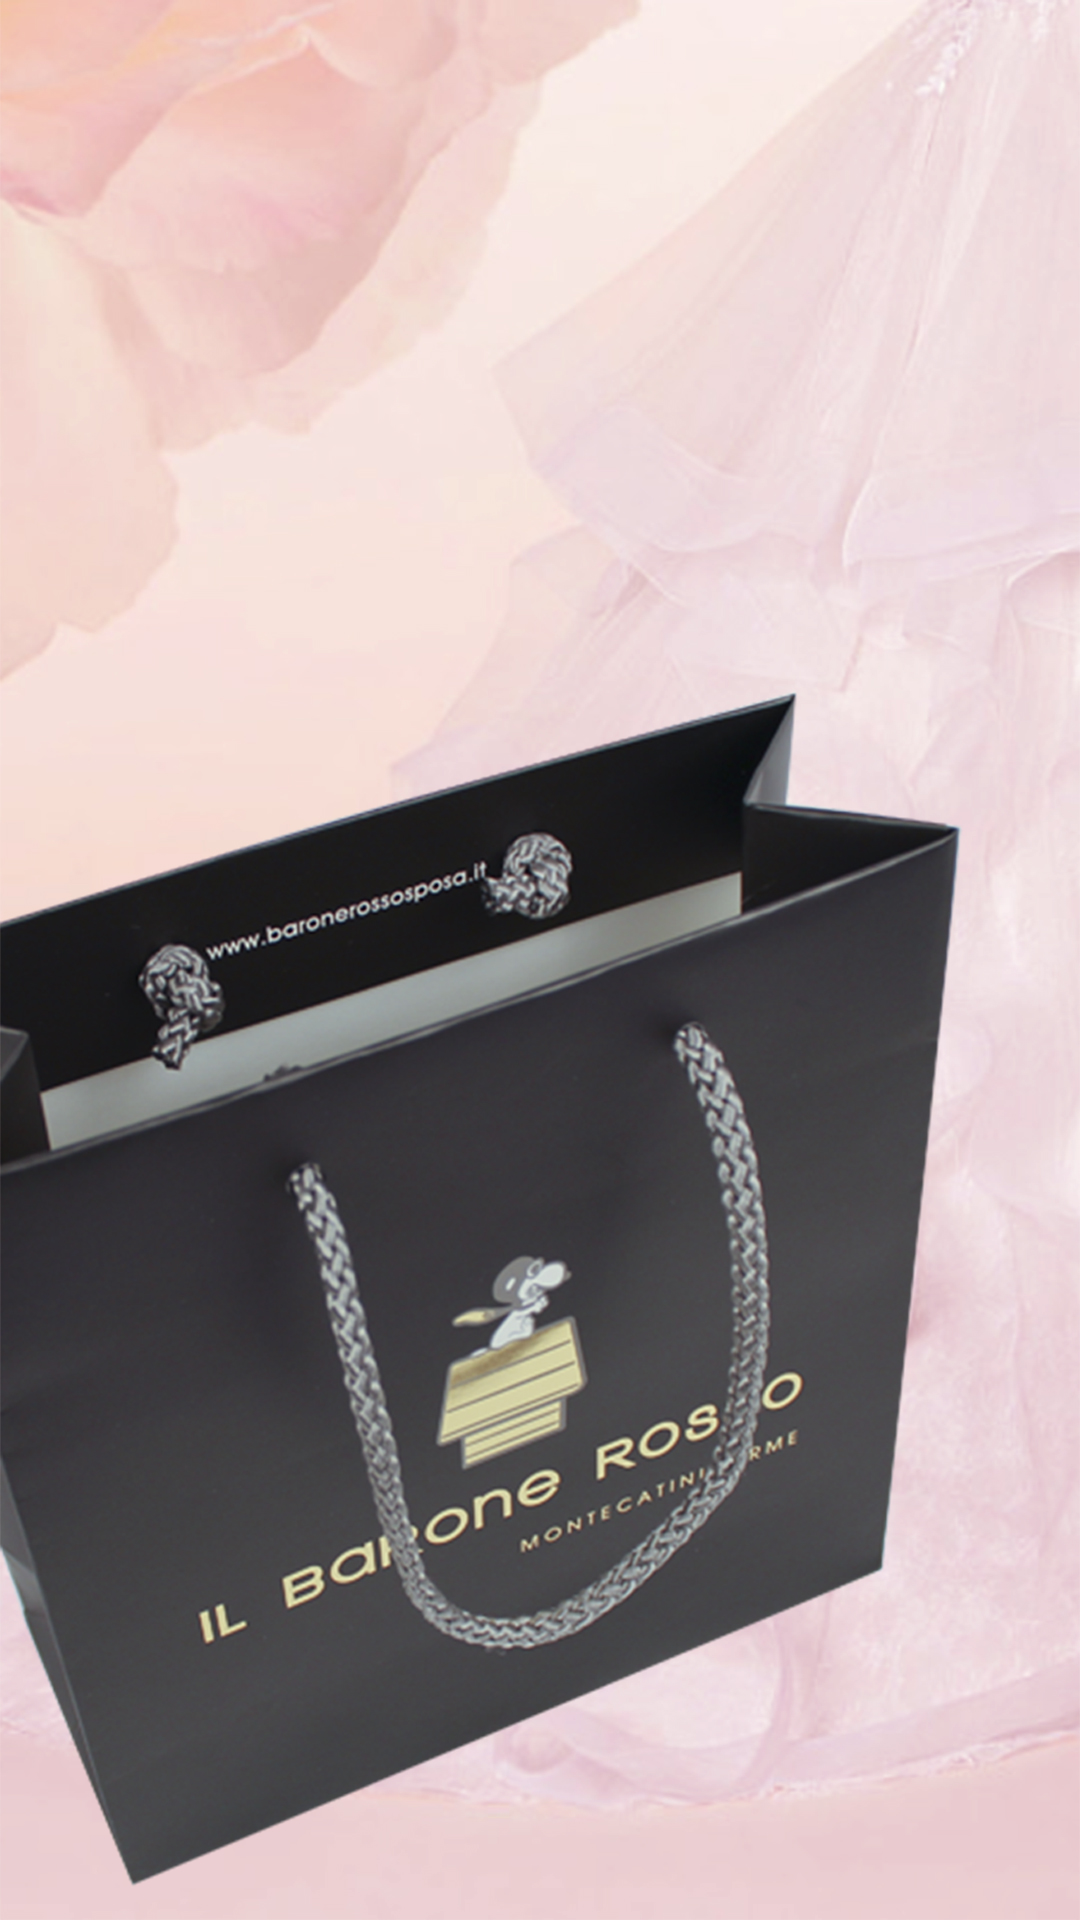 1 | Il Barone Rosso | Shopping bag